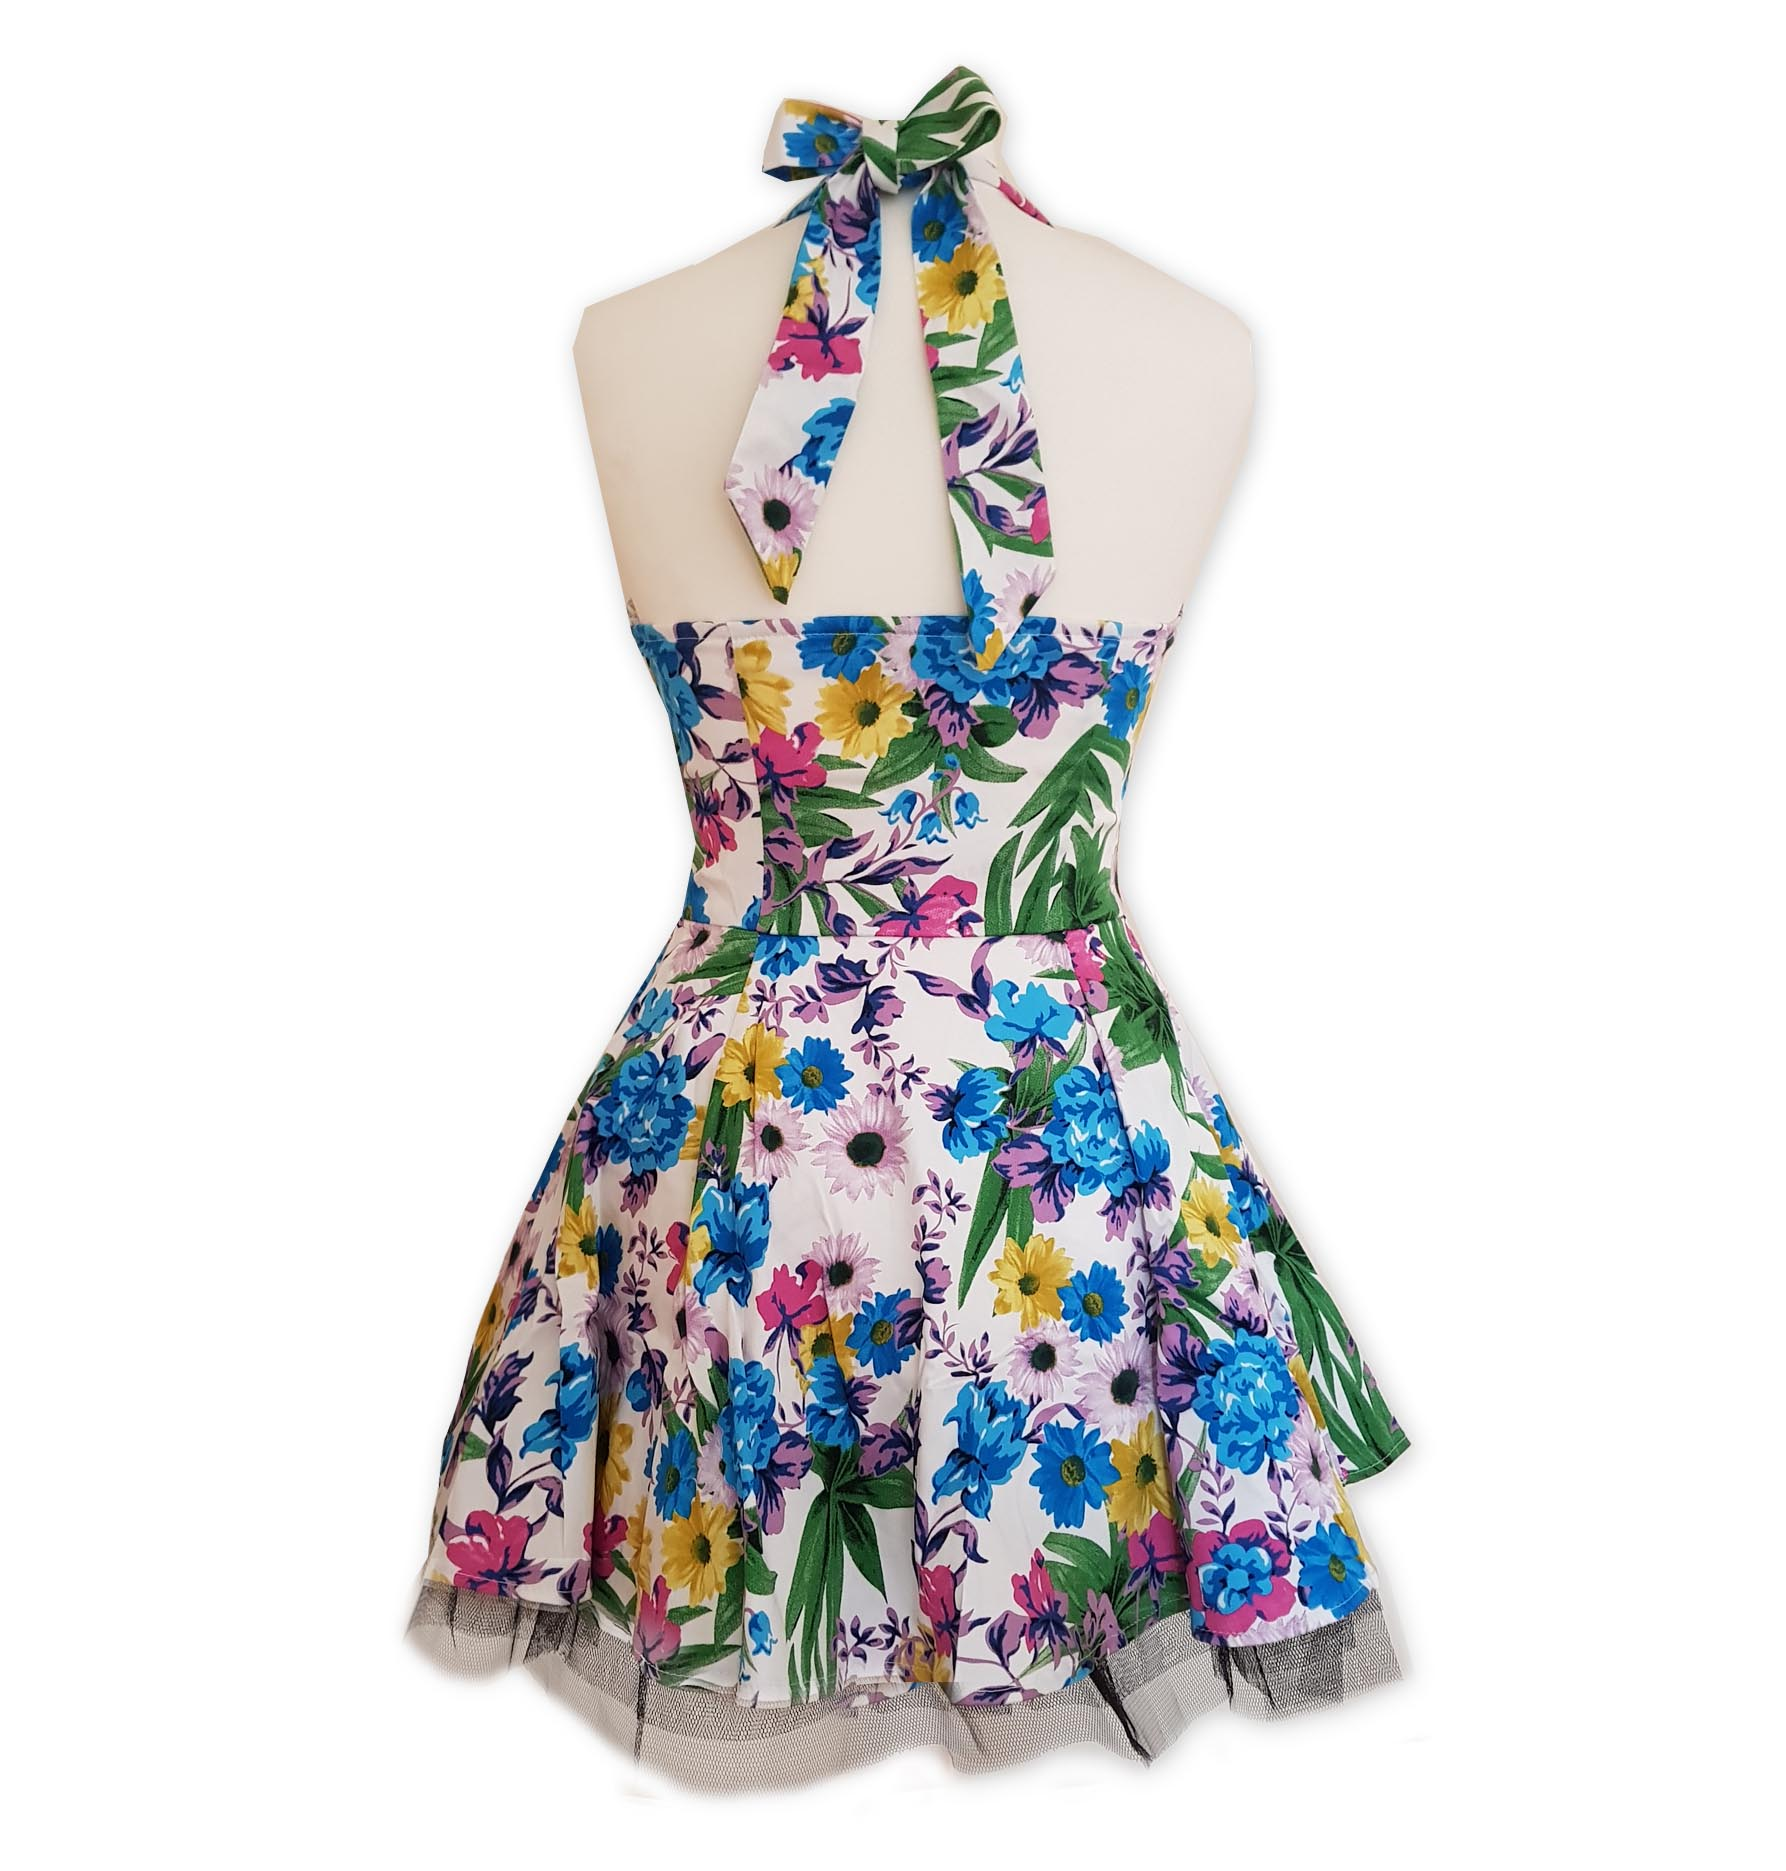 H-amp-R-Hearts-amp-Roses-London-White-Mini-Dress-039-Summer-Day-039-Flowers-All-Sizes thumbnail 17